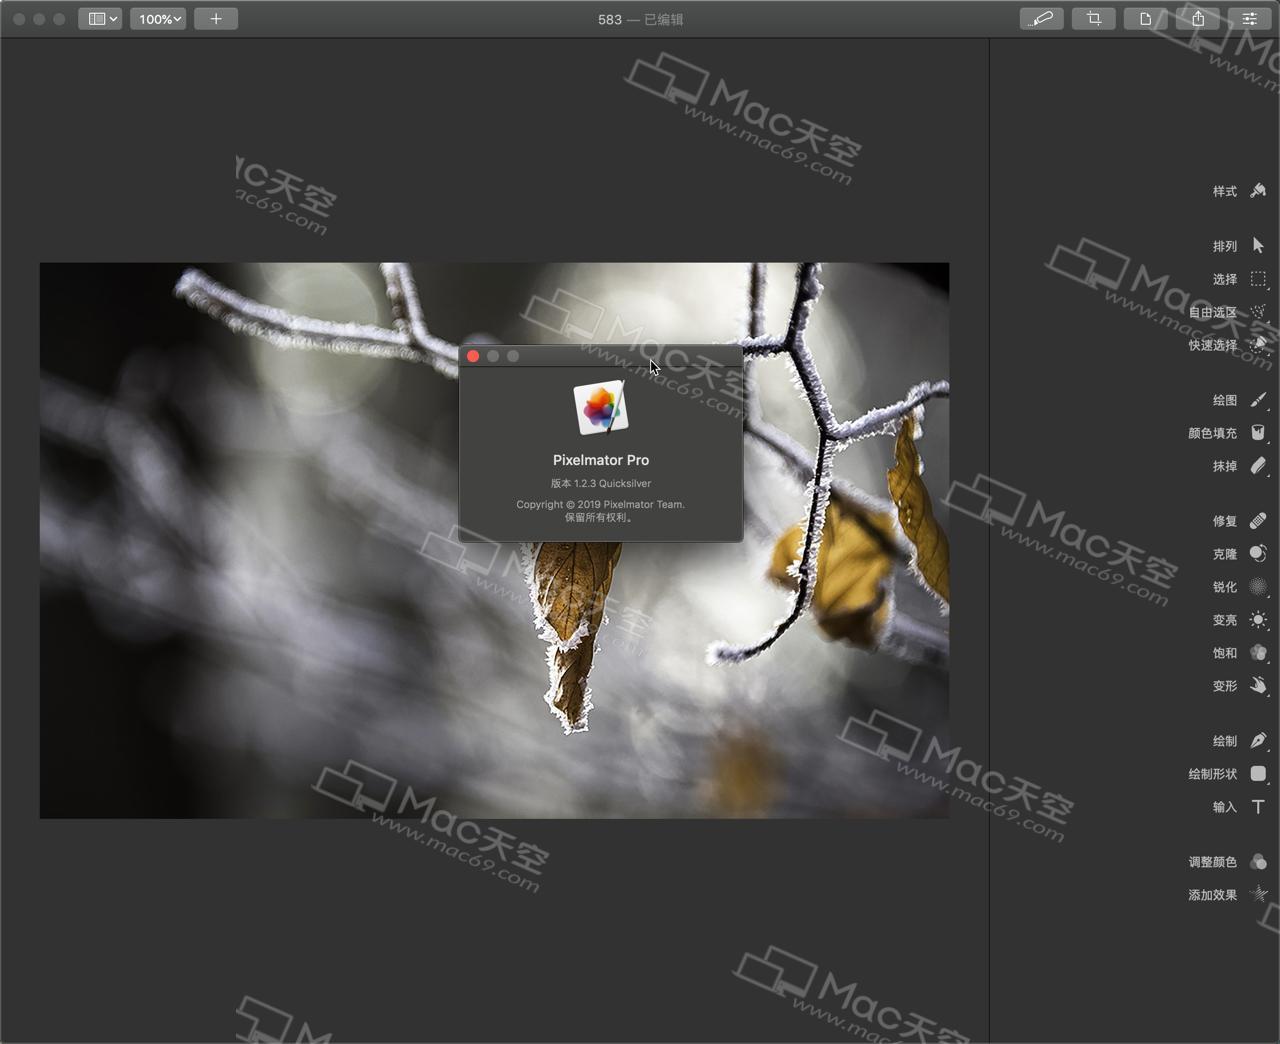 Pixelmator Pro Mac crack version - Programmer Sought